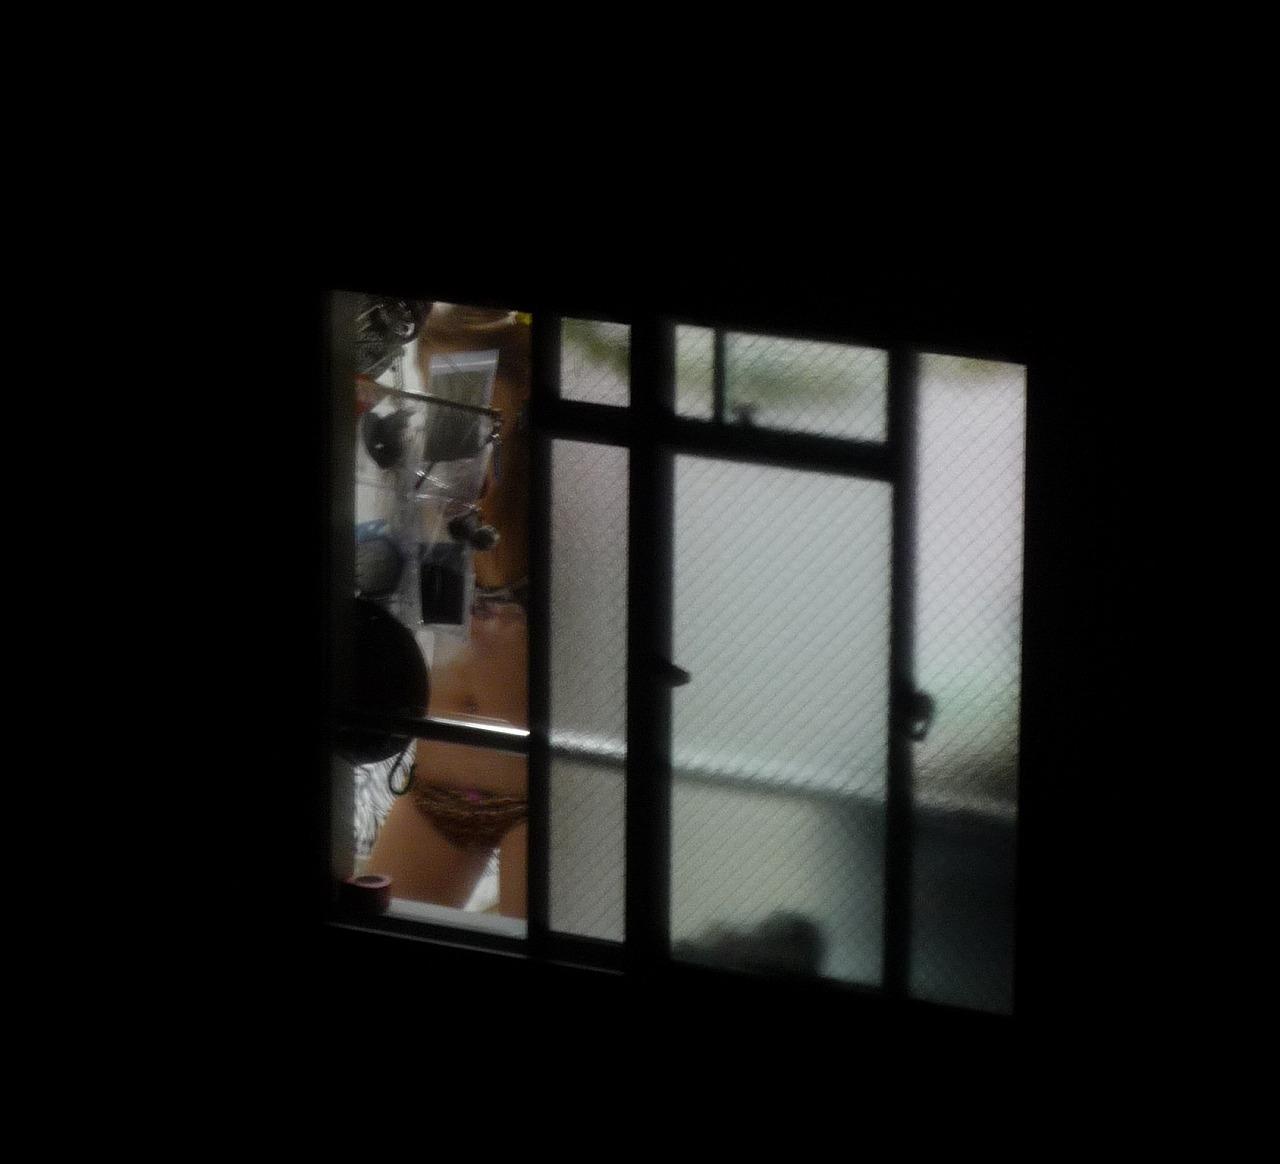 民家 窓 盗撮